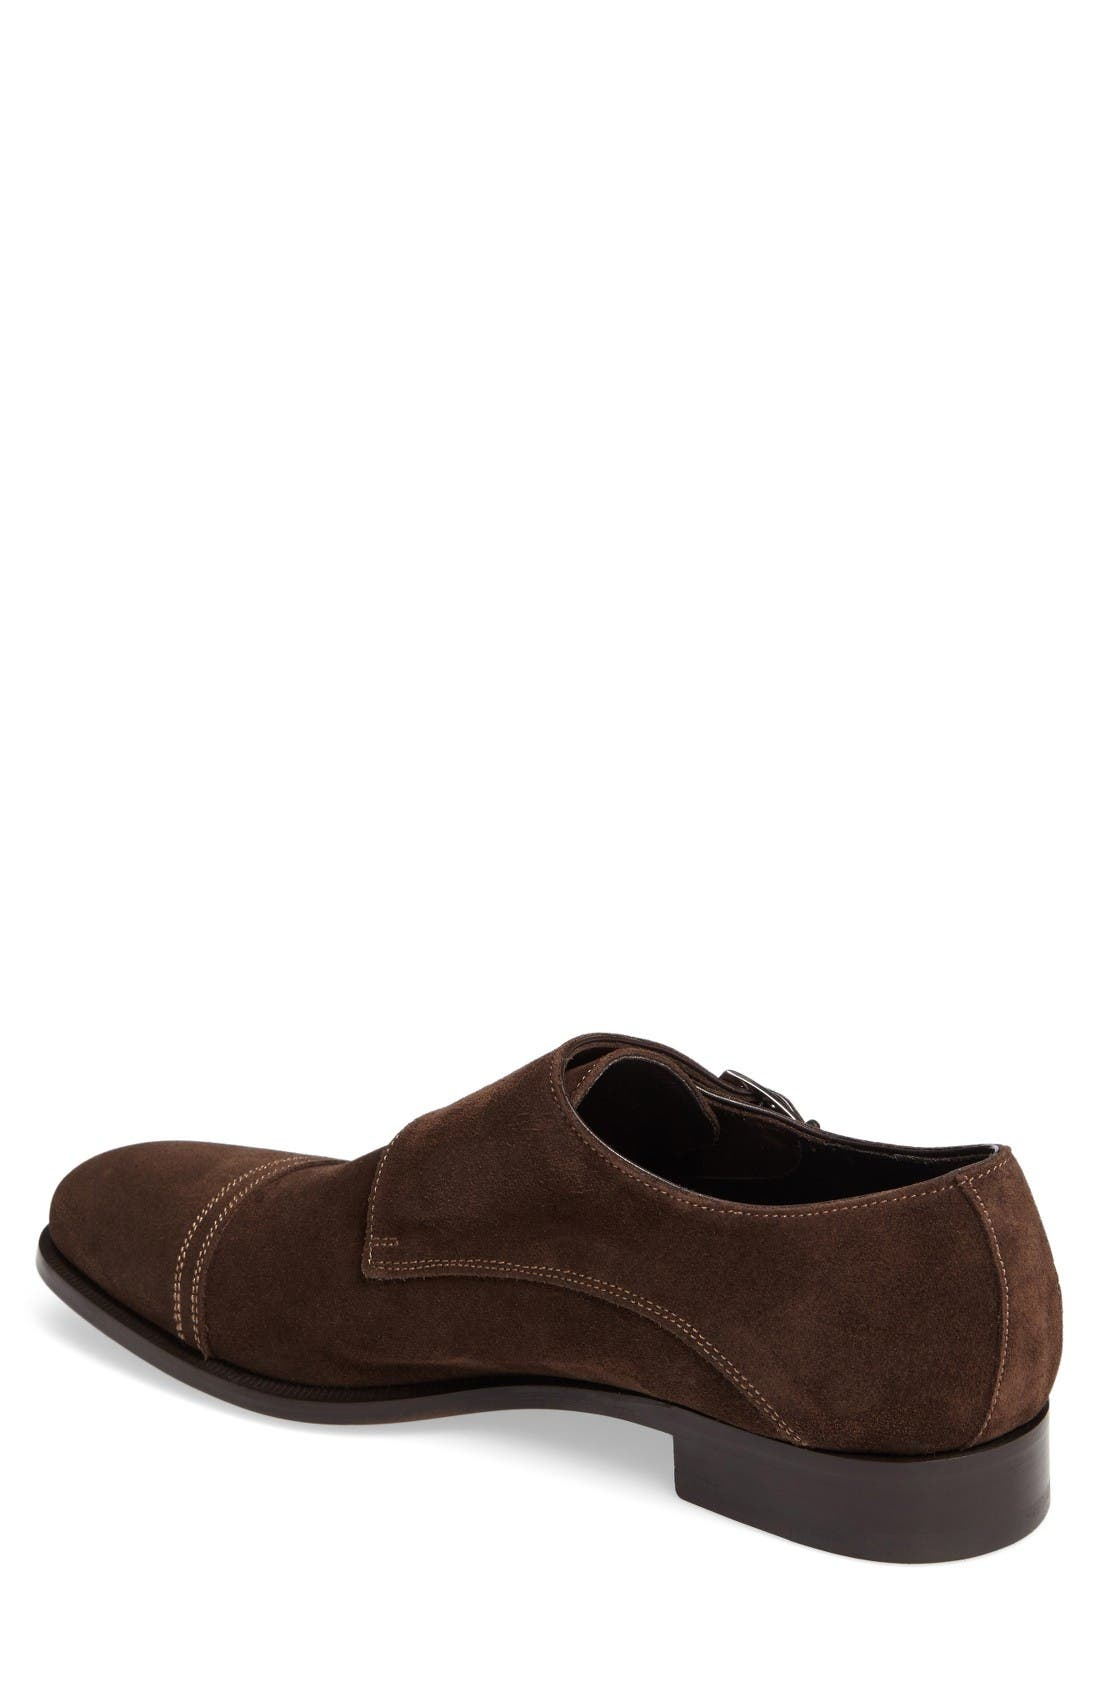 Alternate Image 2  - Crosby Square Conley Double Monk Strap Shoe (Men)